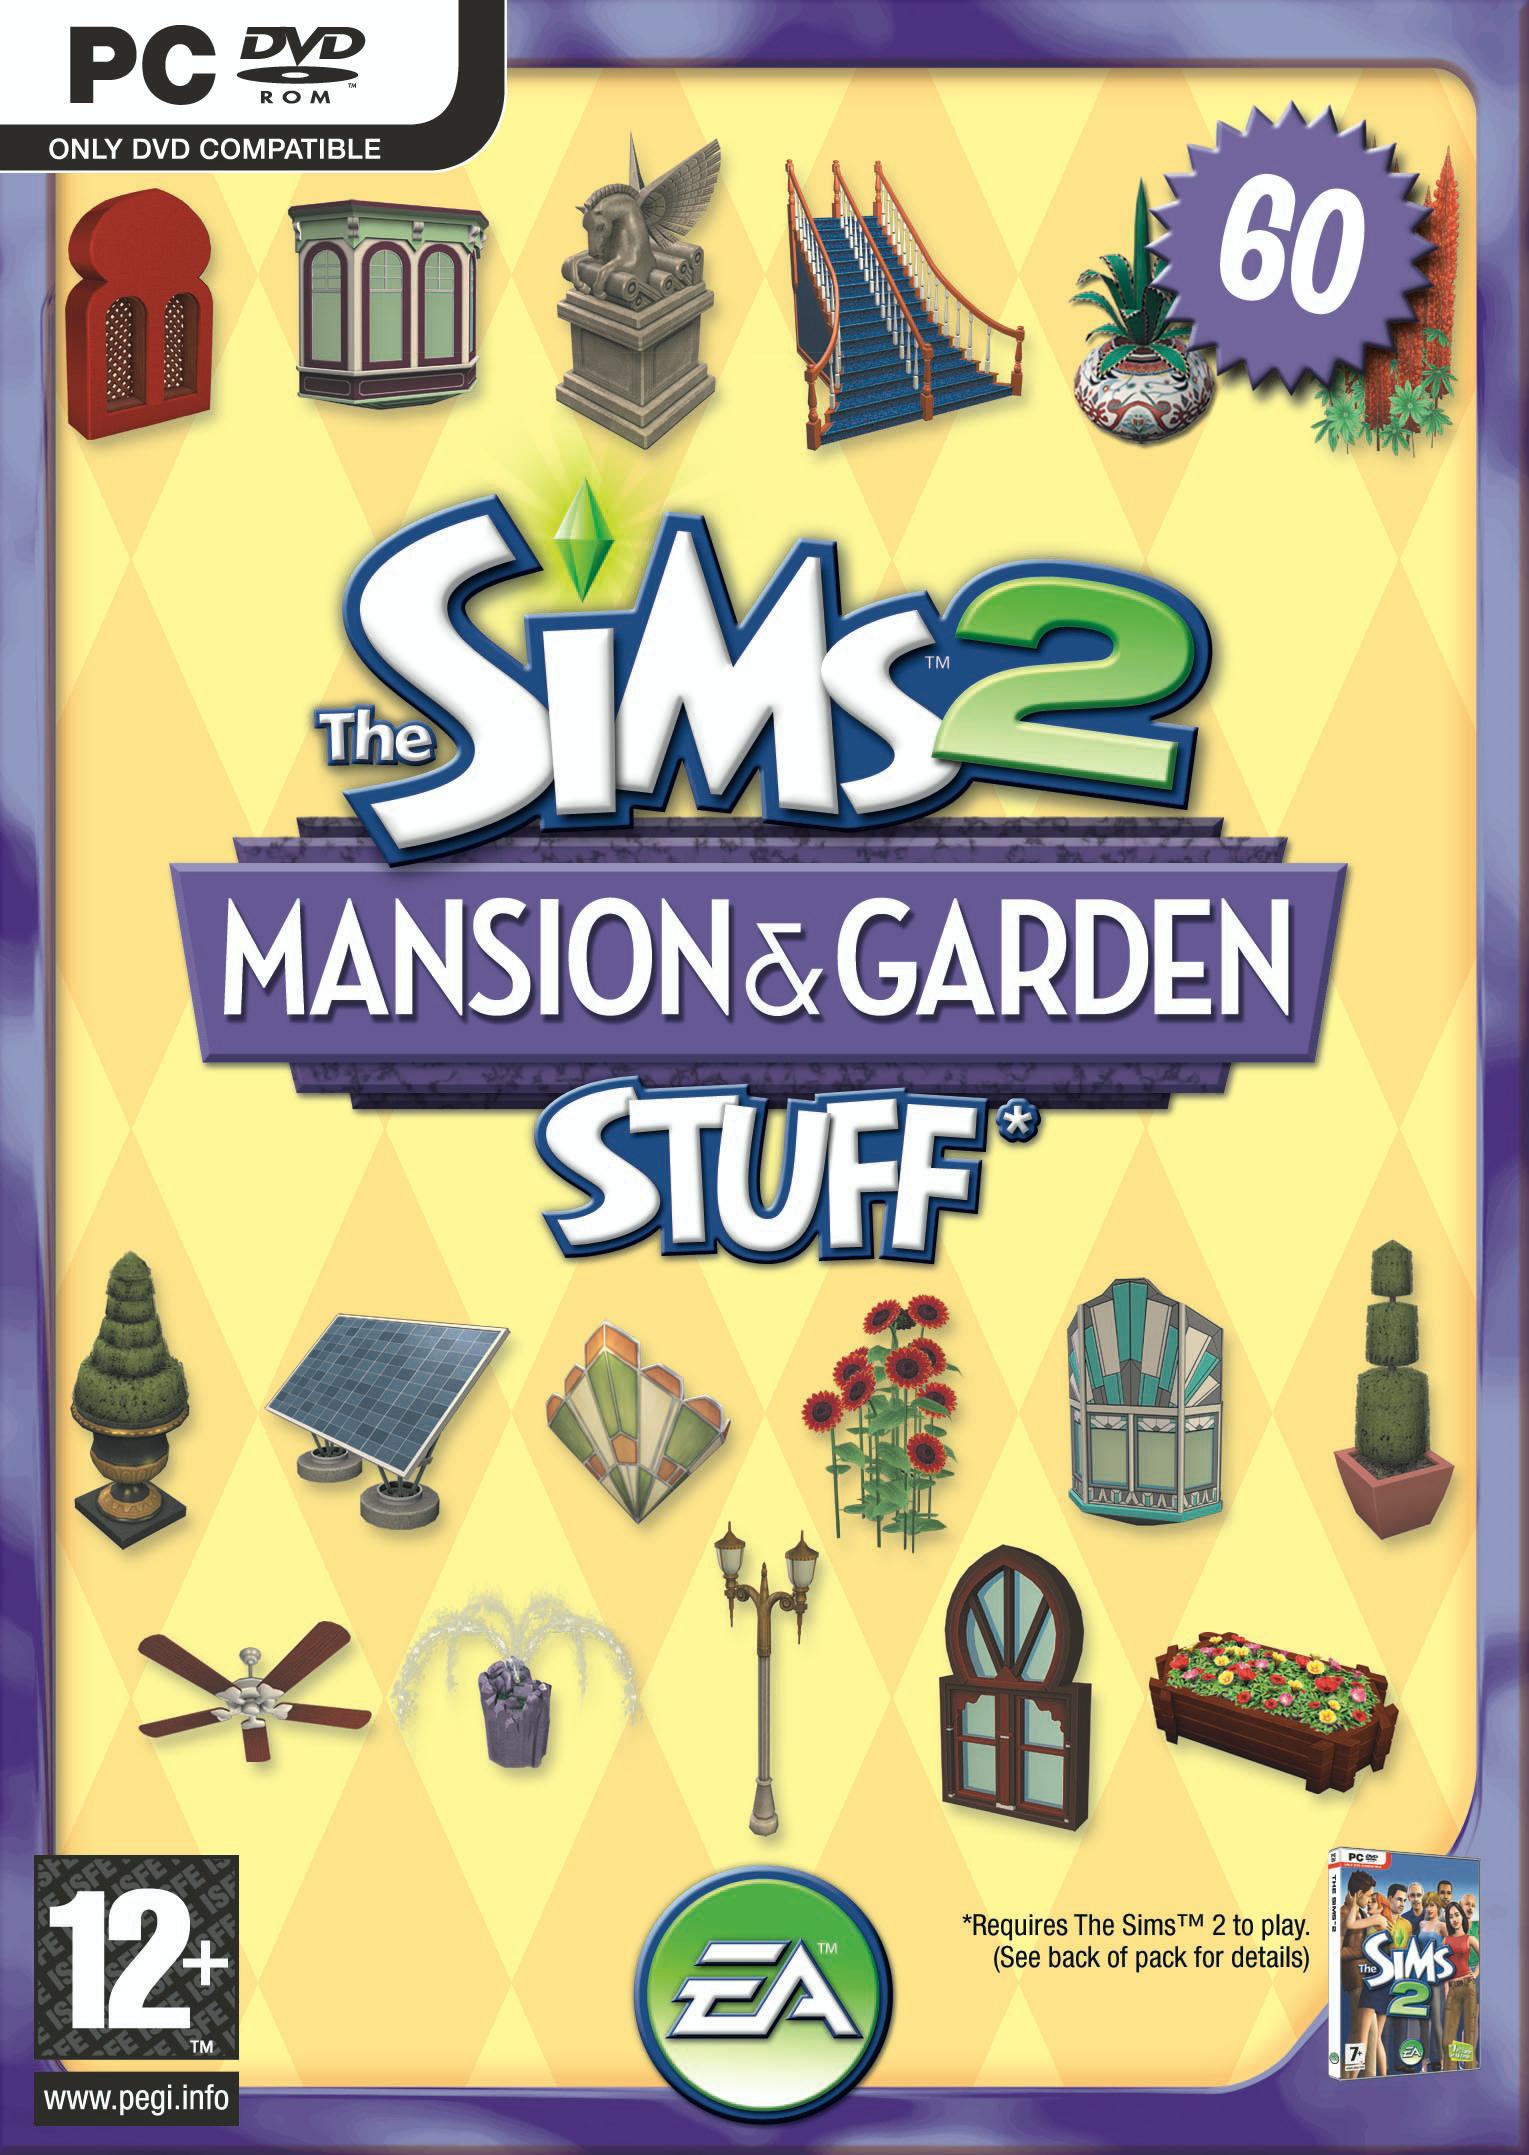 File:Mansion garden box art.jpg